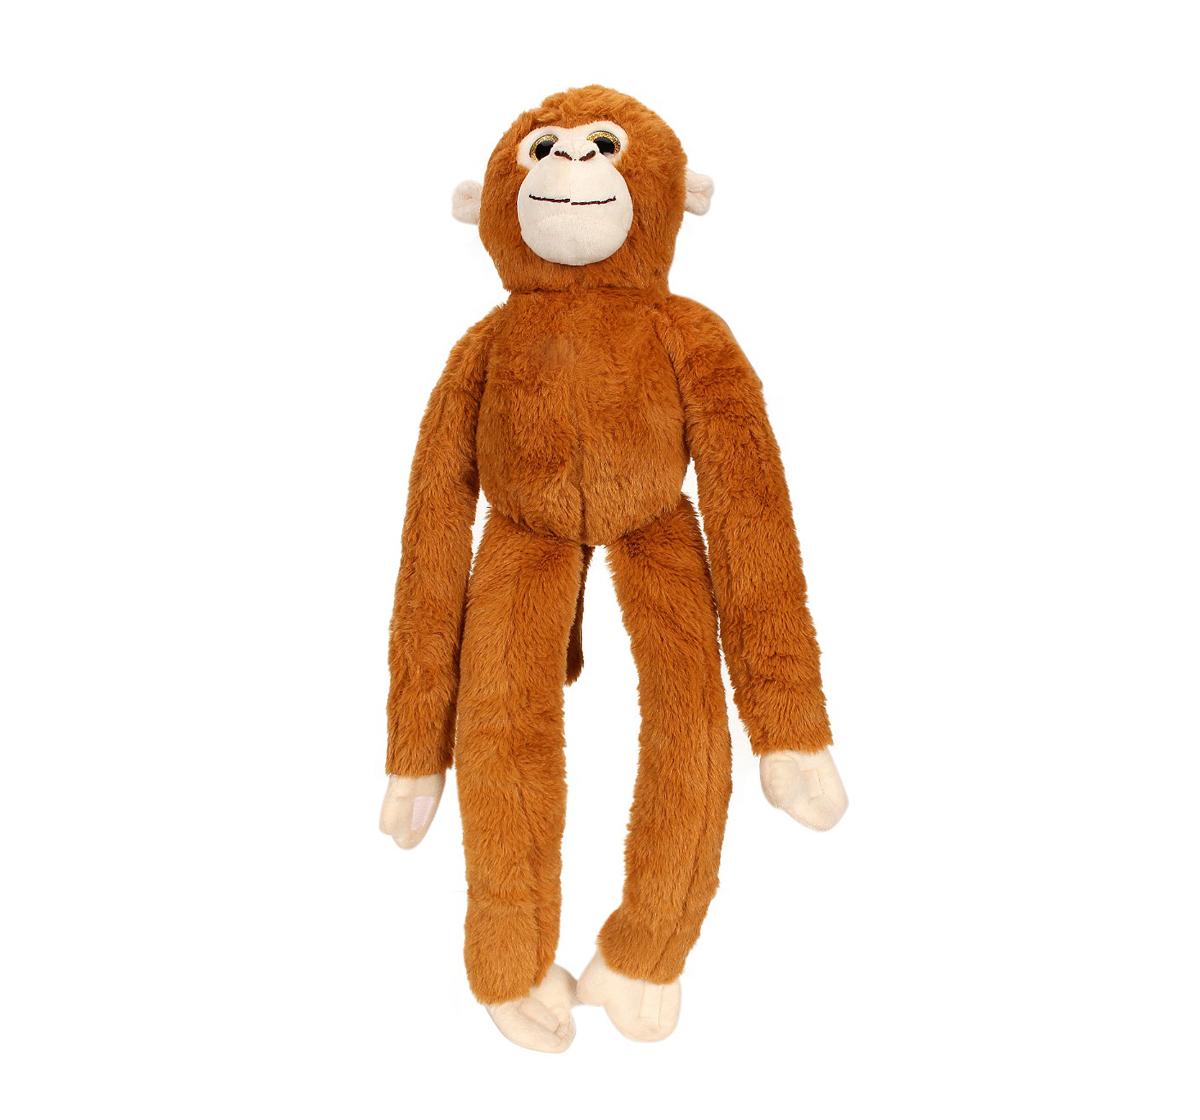 Fuzzbuzz | Fuzzbuzz Monkey Animal Plush - Brown - 61Cm Quirky Soft Toys for Kids age 0M+ - 12 Cm (Brown)